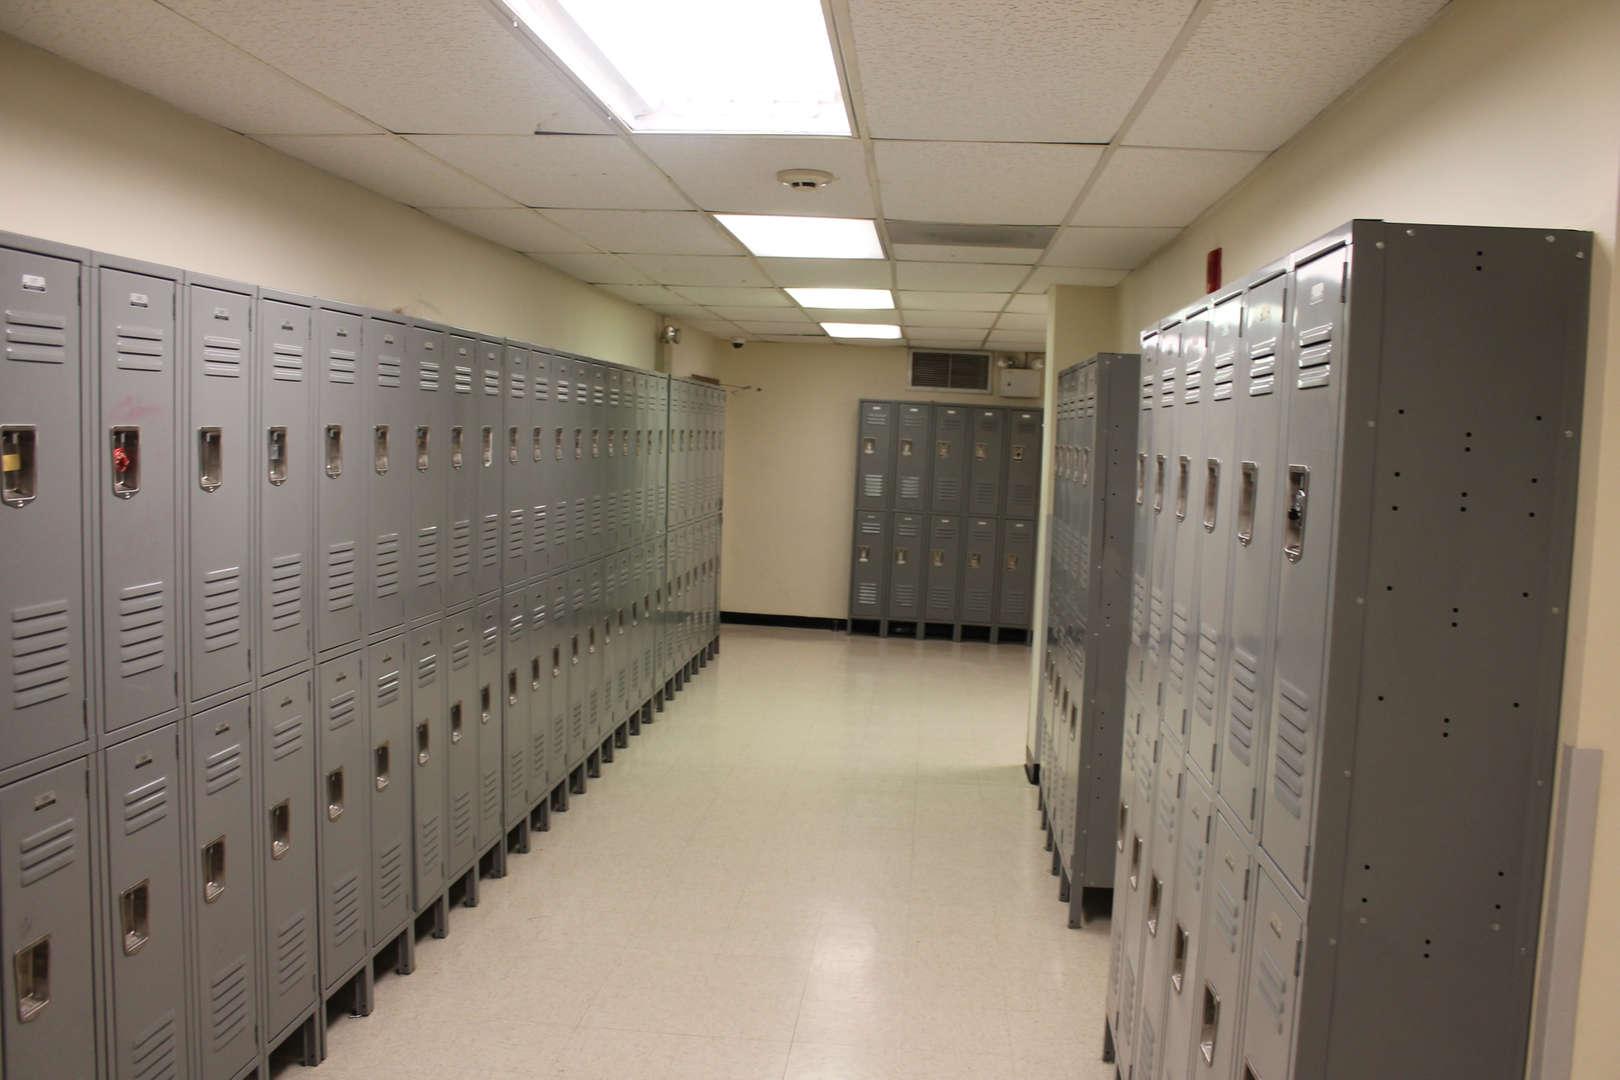 Lockers in a school hallway